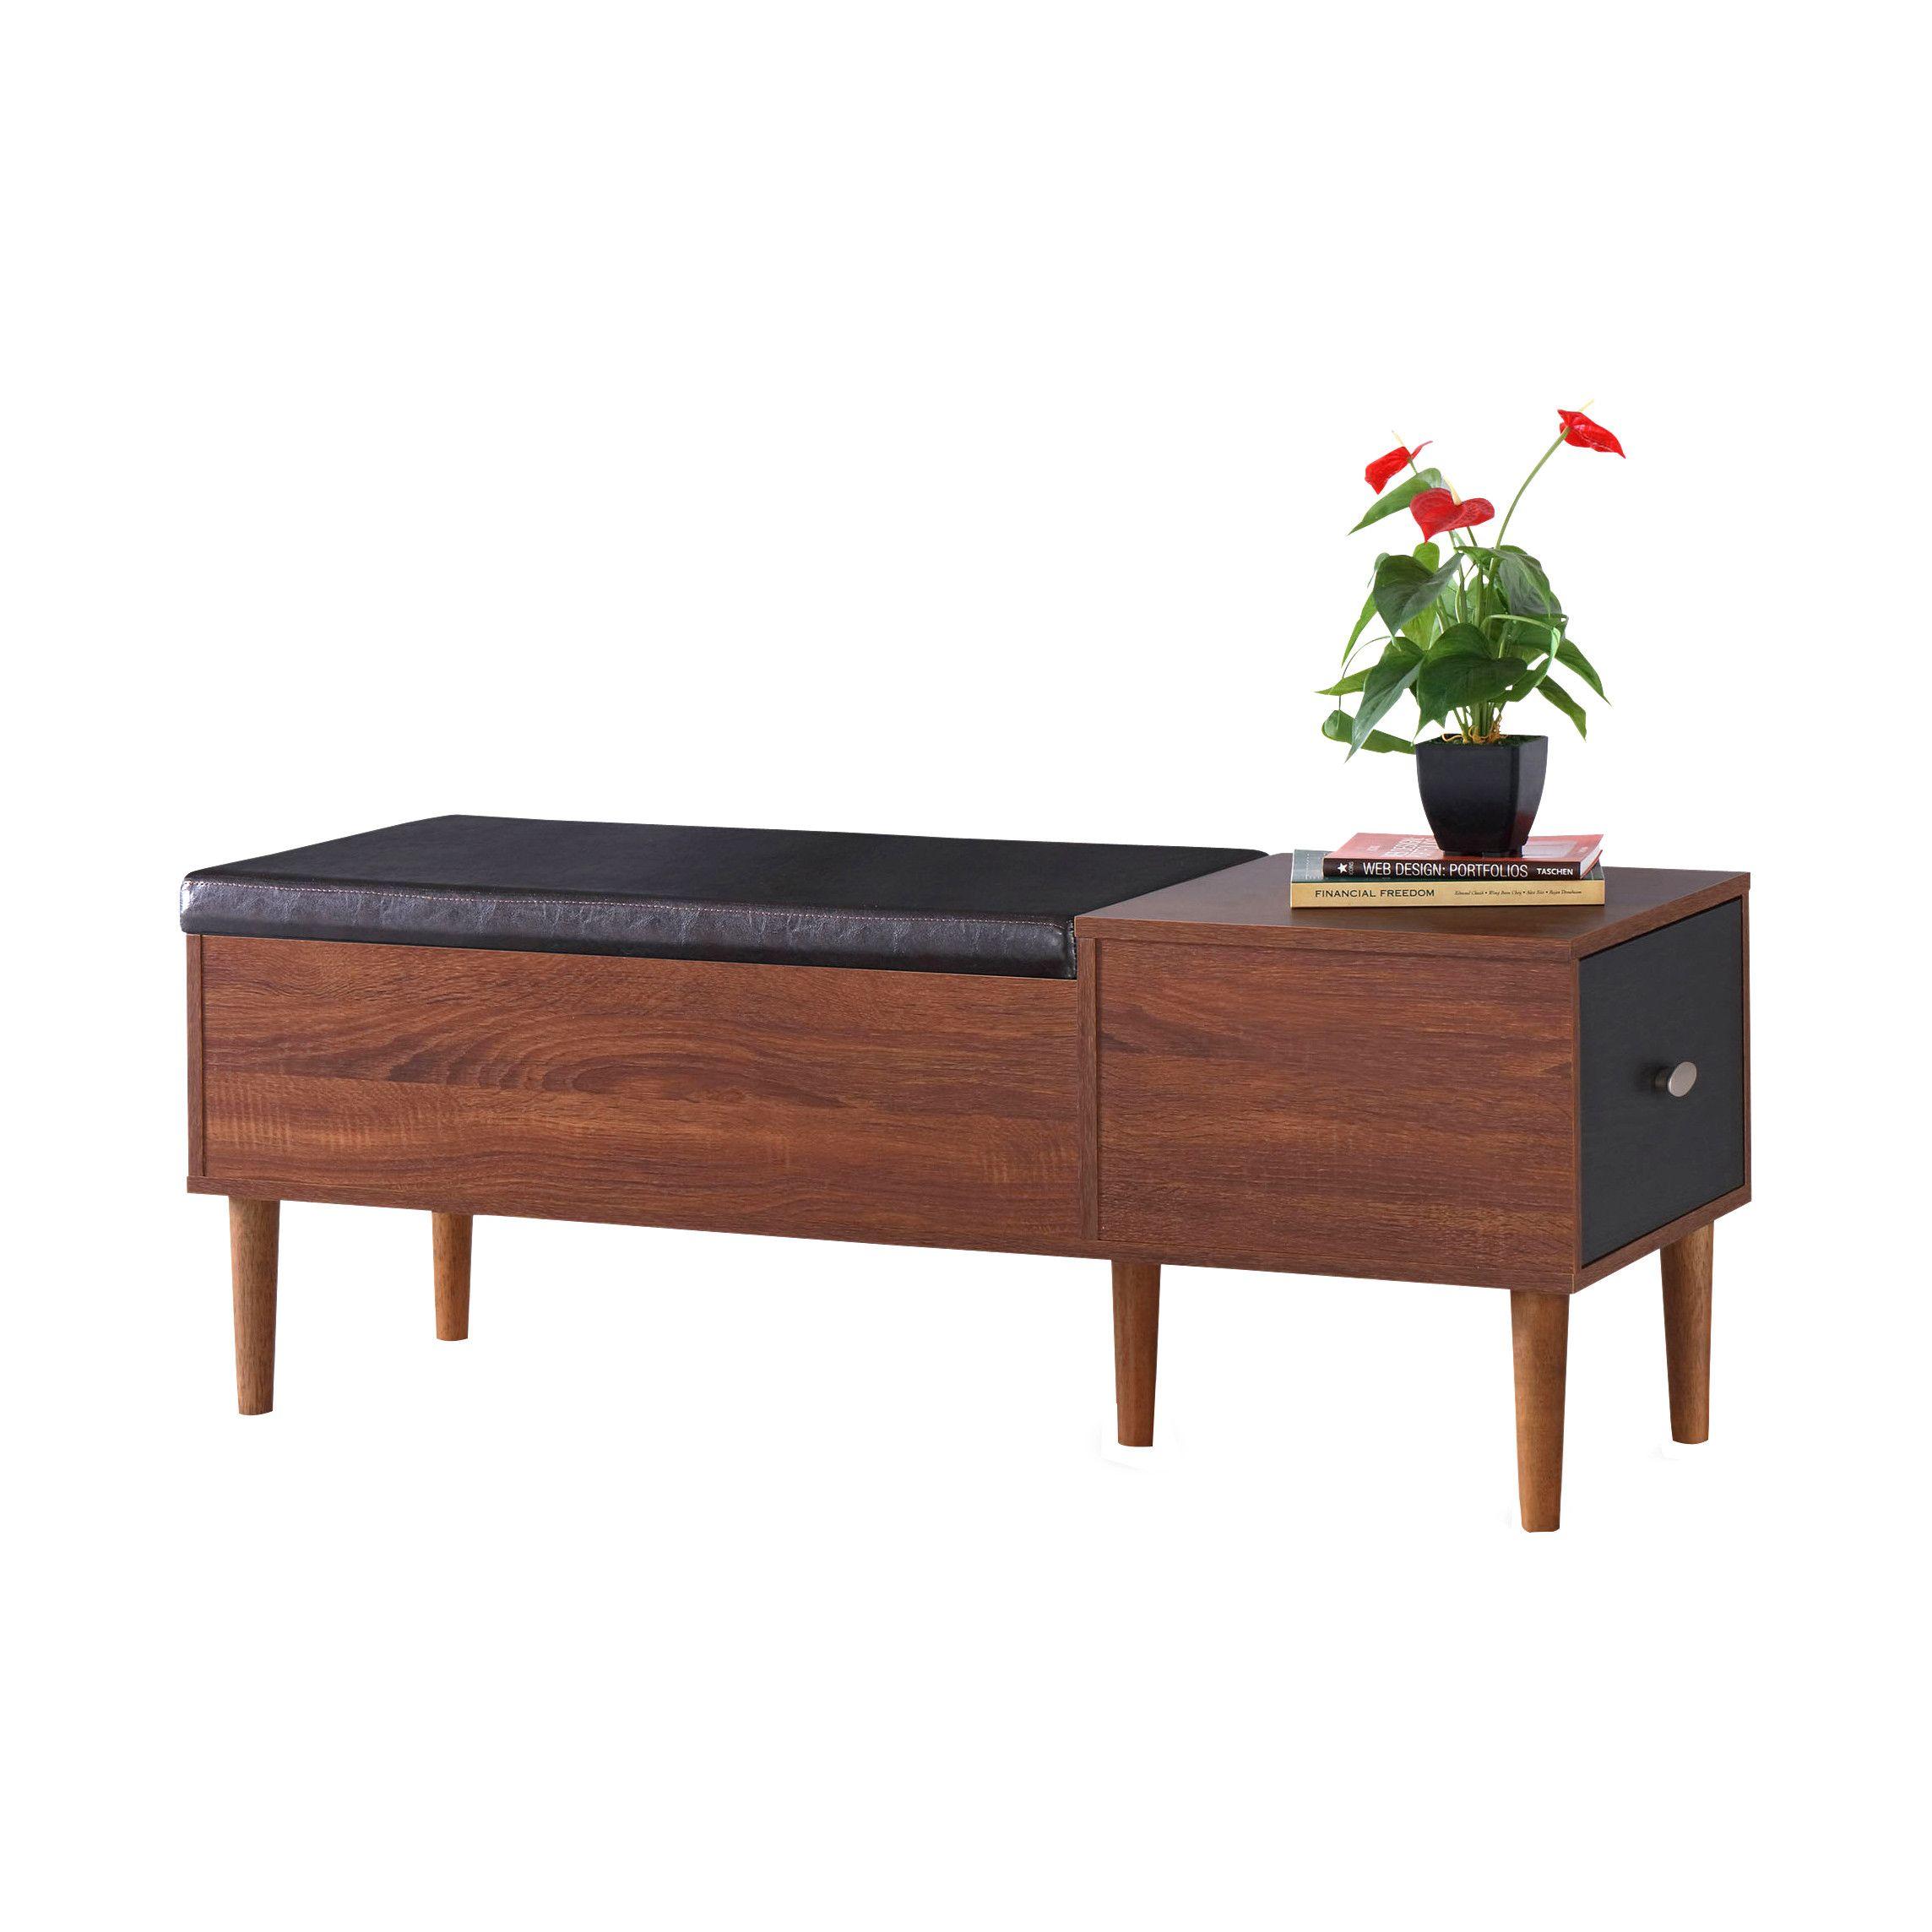 Ardina Wood Storage Bench Wood Storage Bench Upholstered Storage Bench Entryway Bench Storage